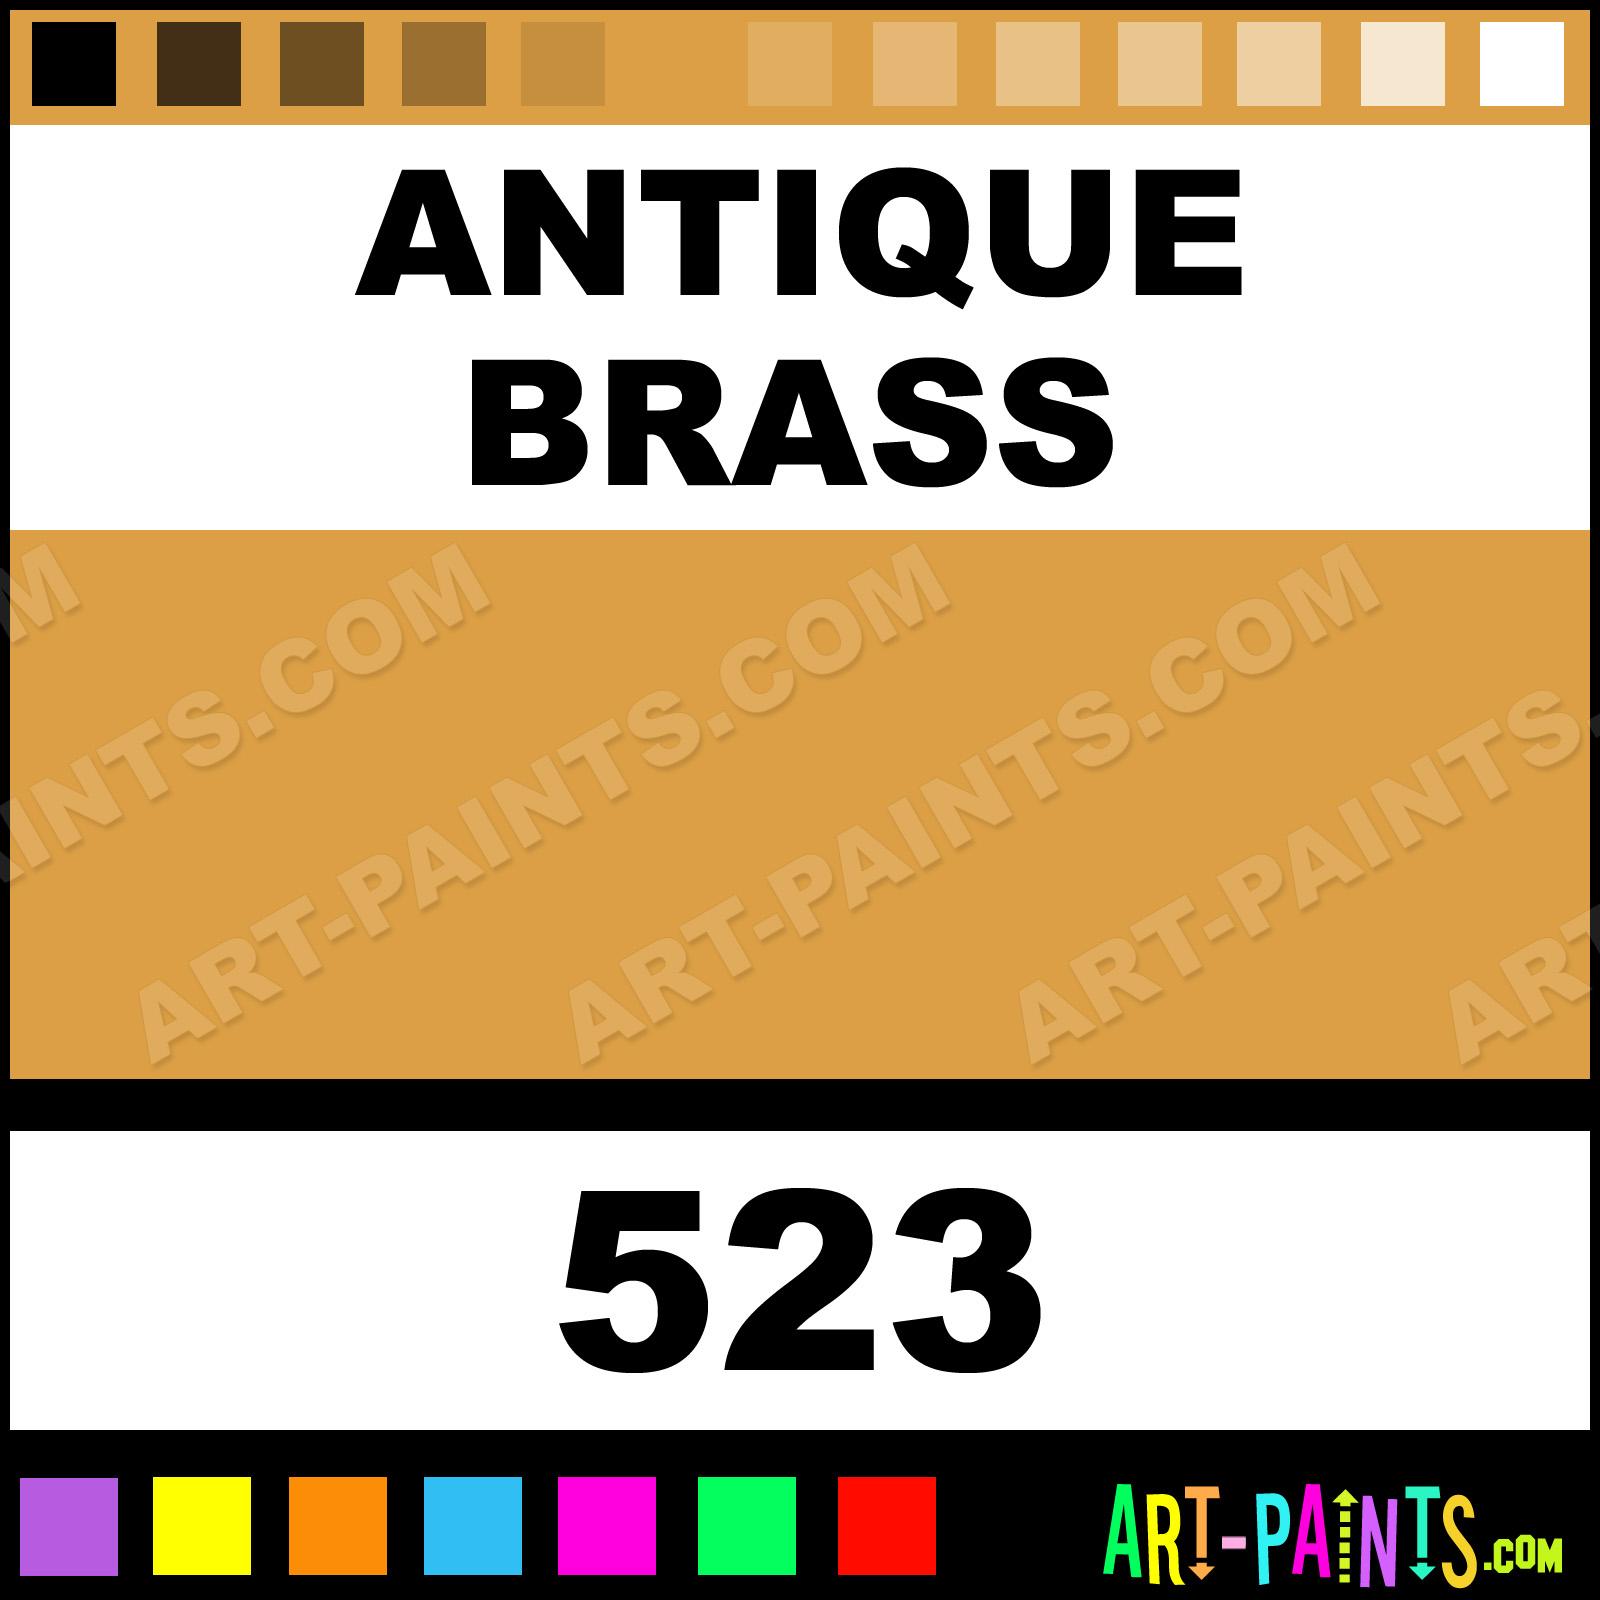 antique brass metallic metal and metallic paints 523 antique